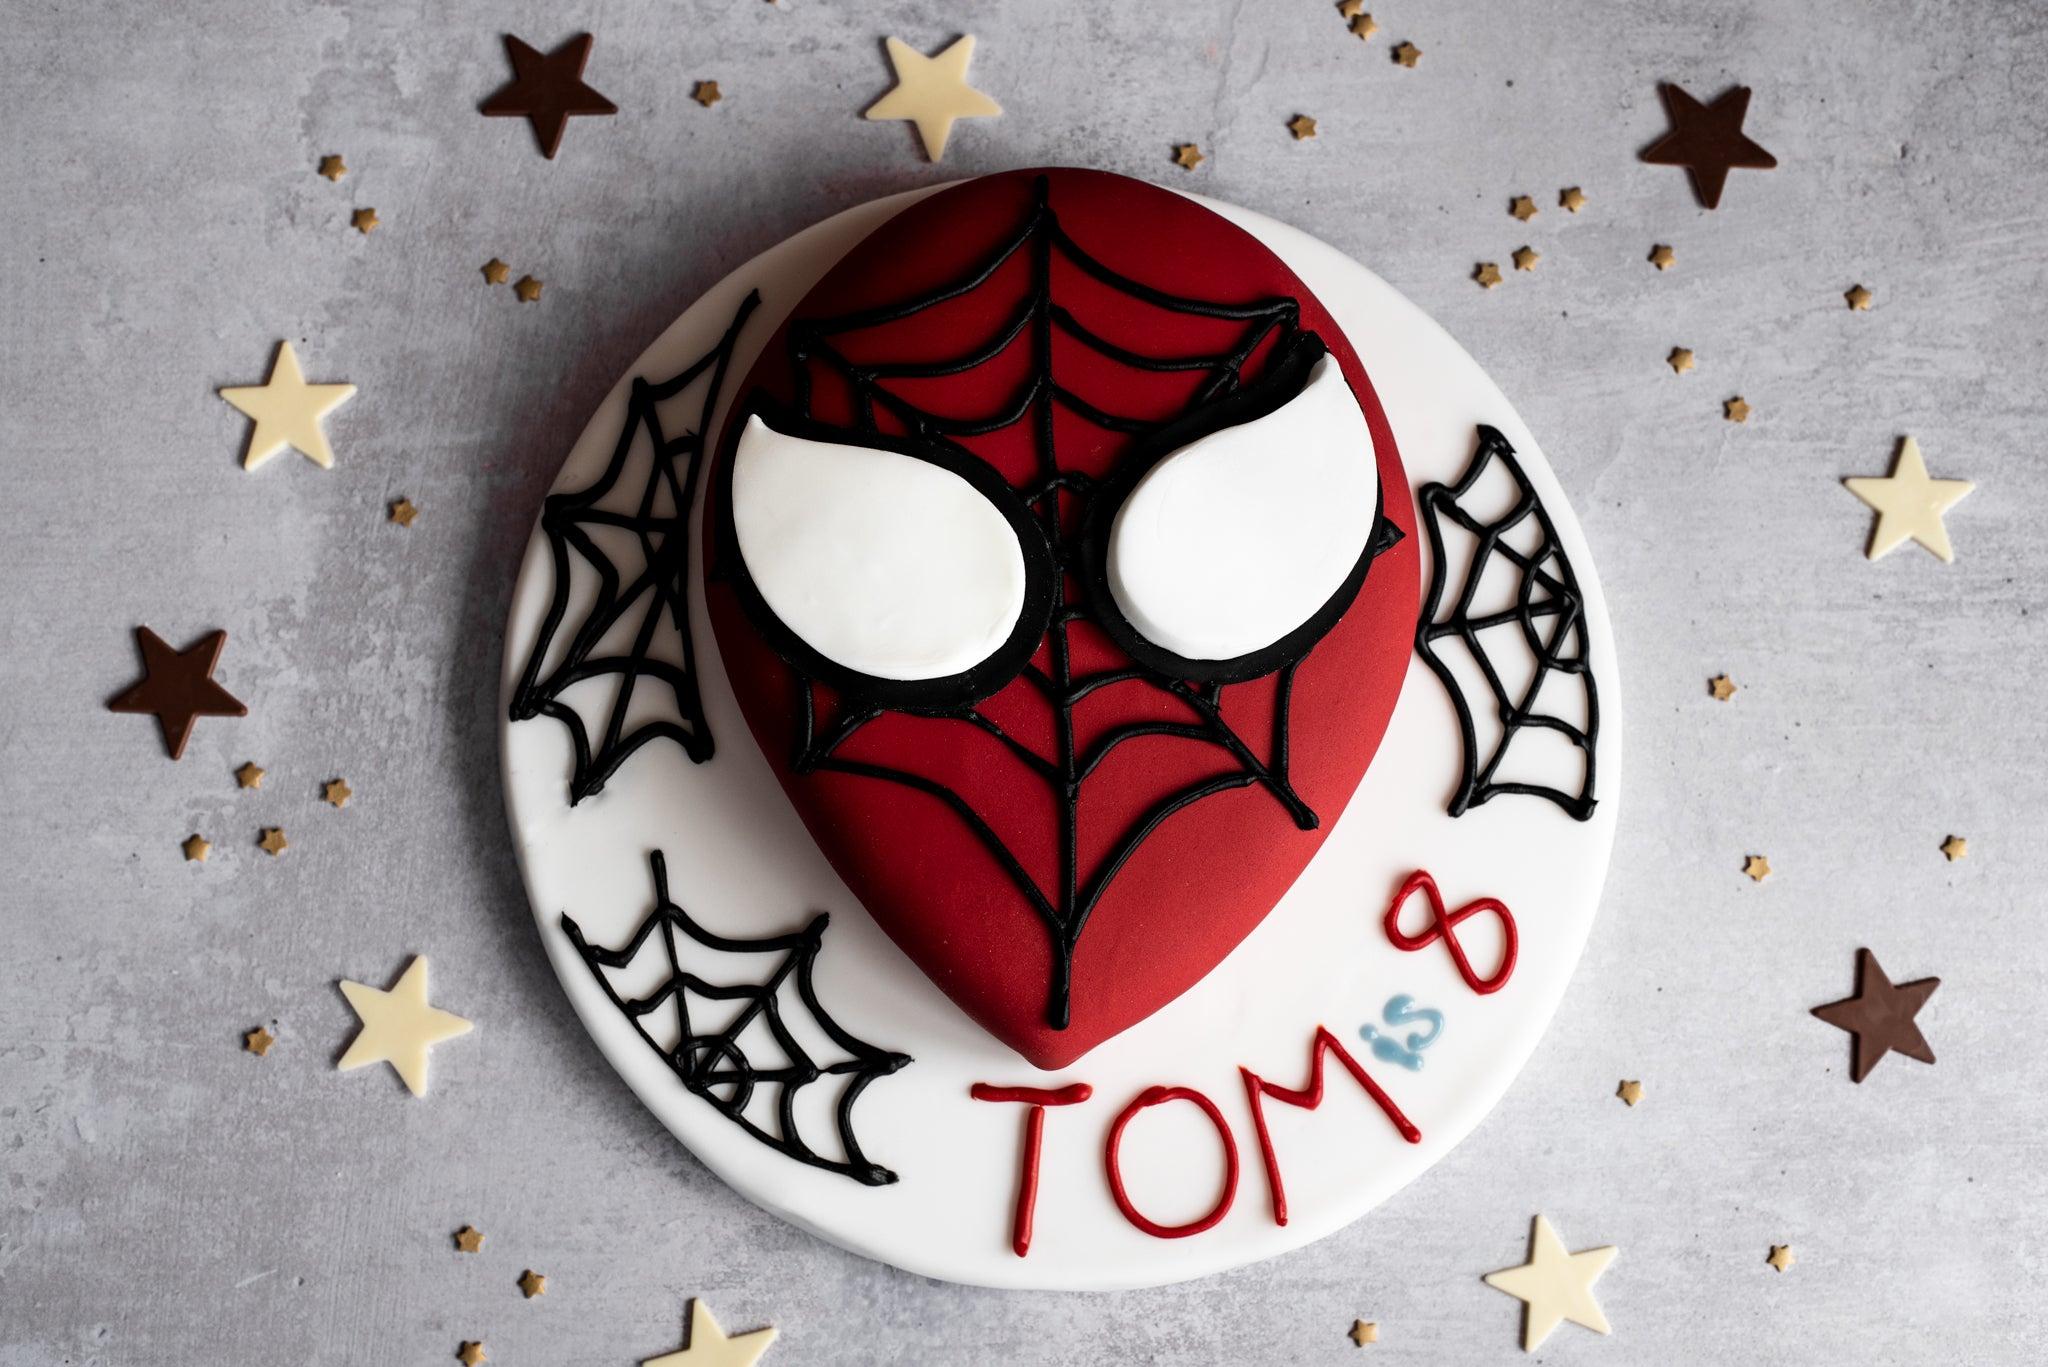 Spiderman-Cake-WEB-RES-2.jpg